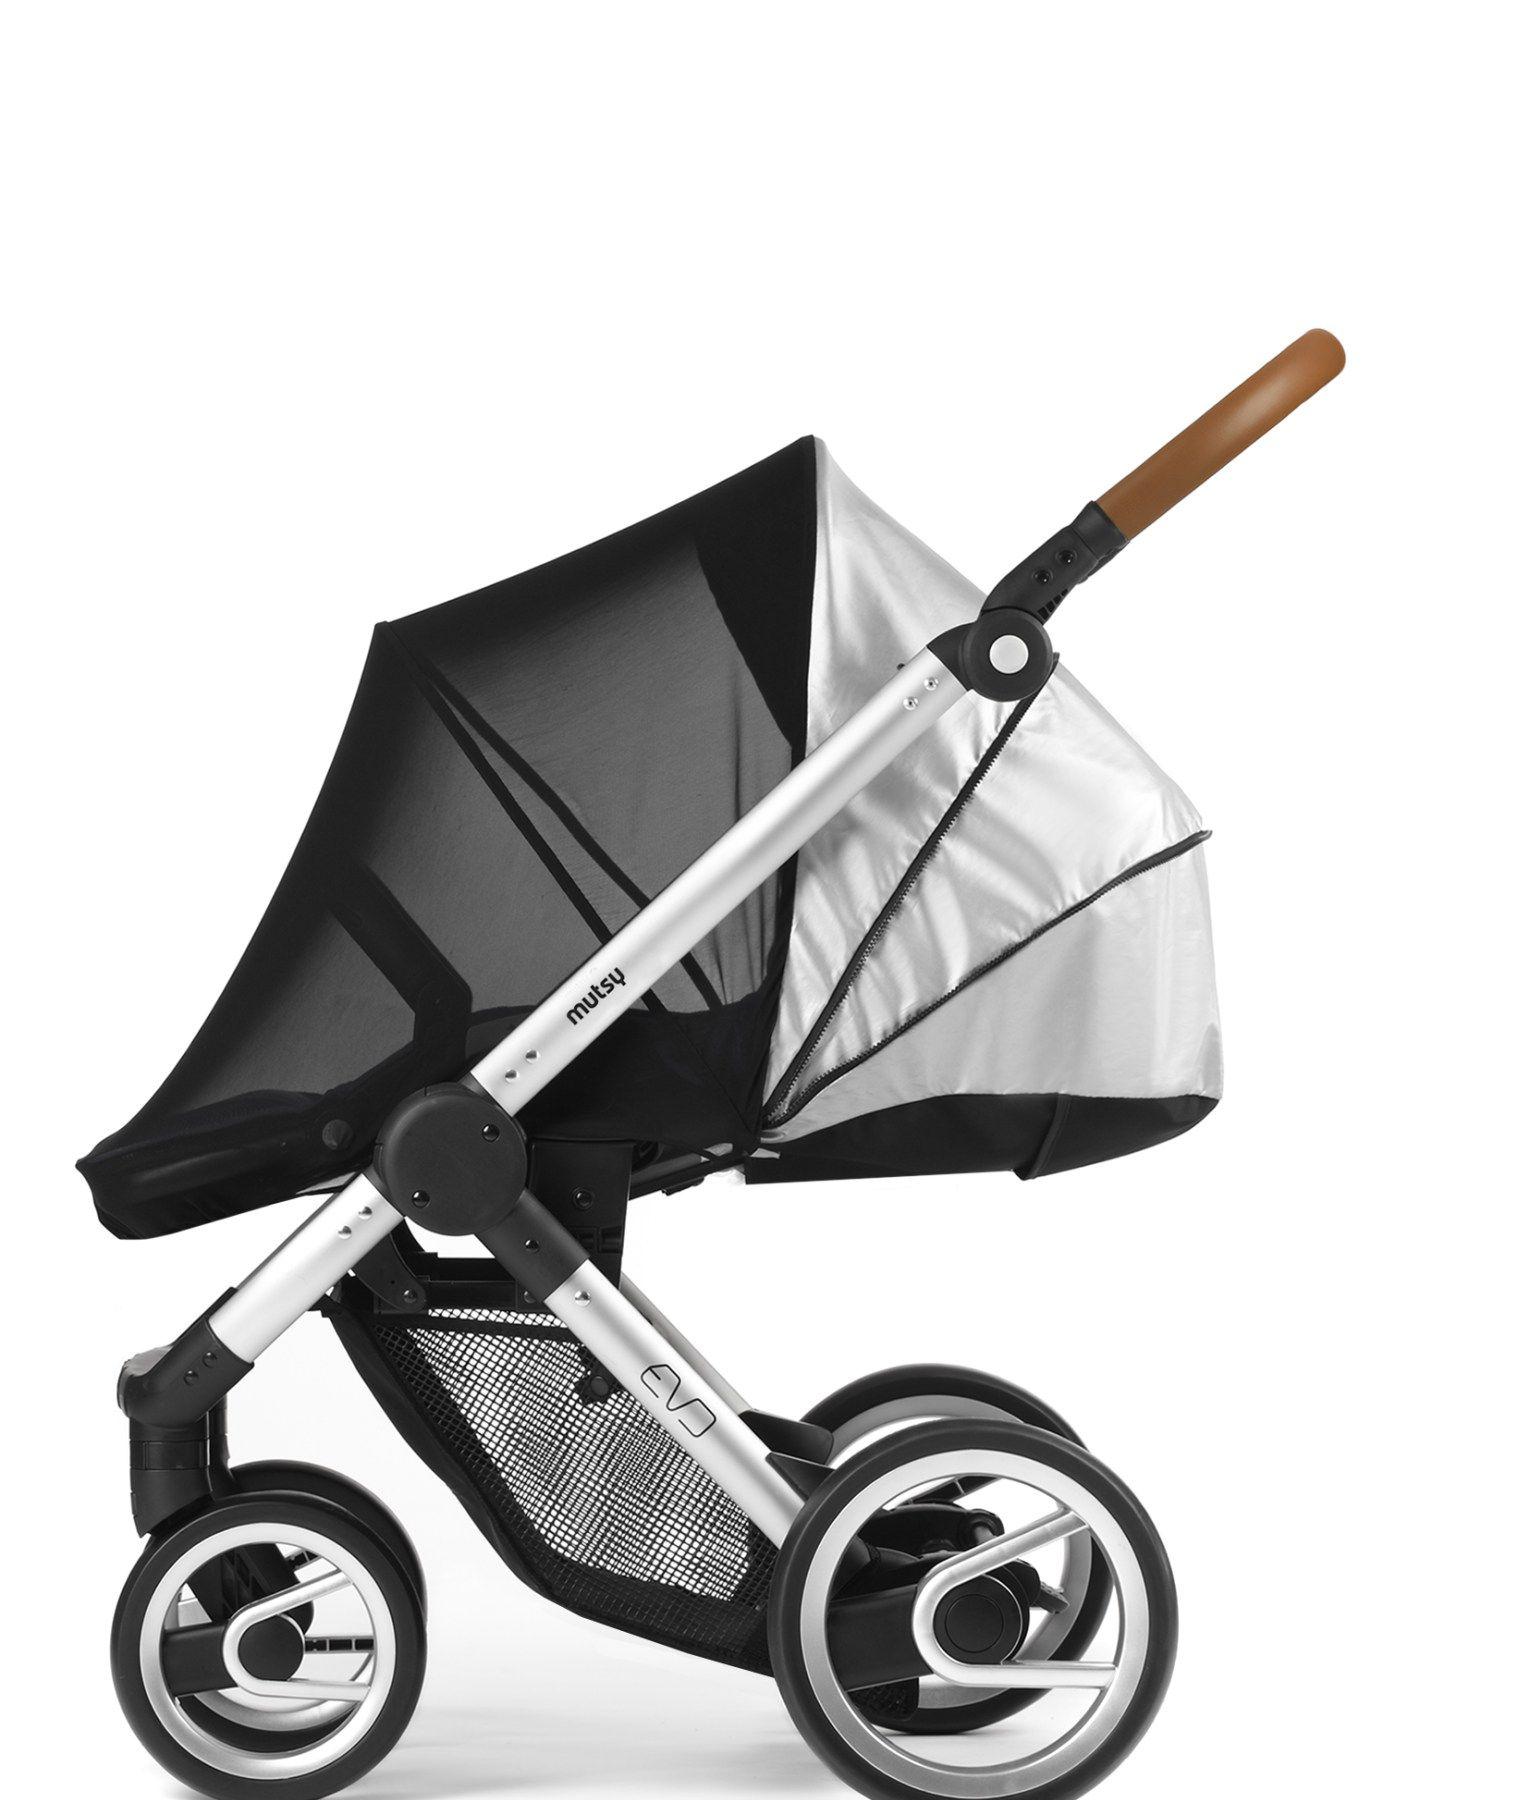 Mutsy Evo UV Cover for Seat Urban stroller, Baby